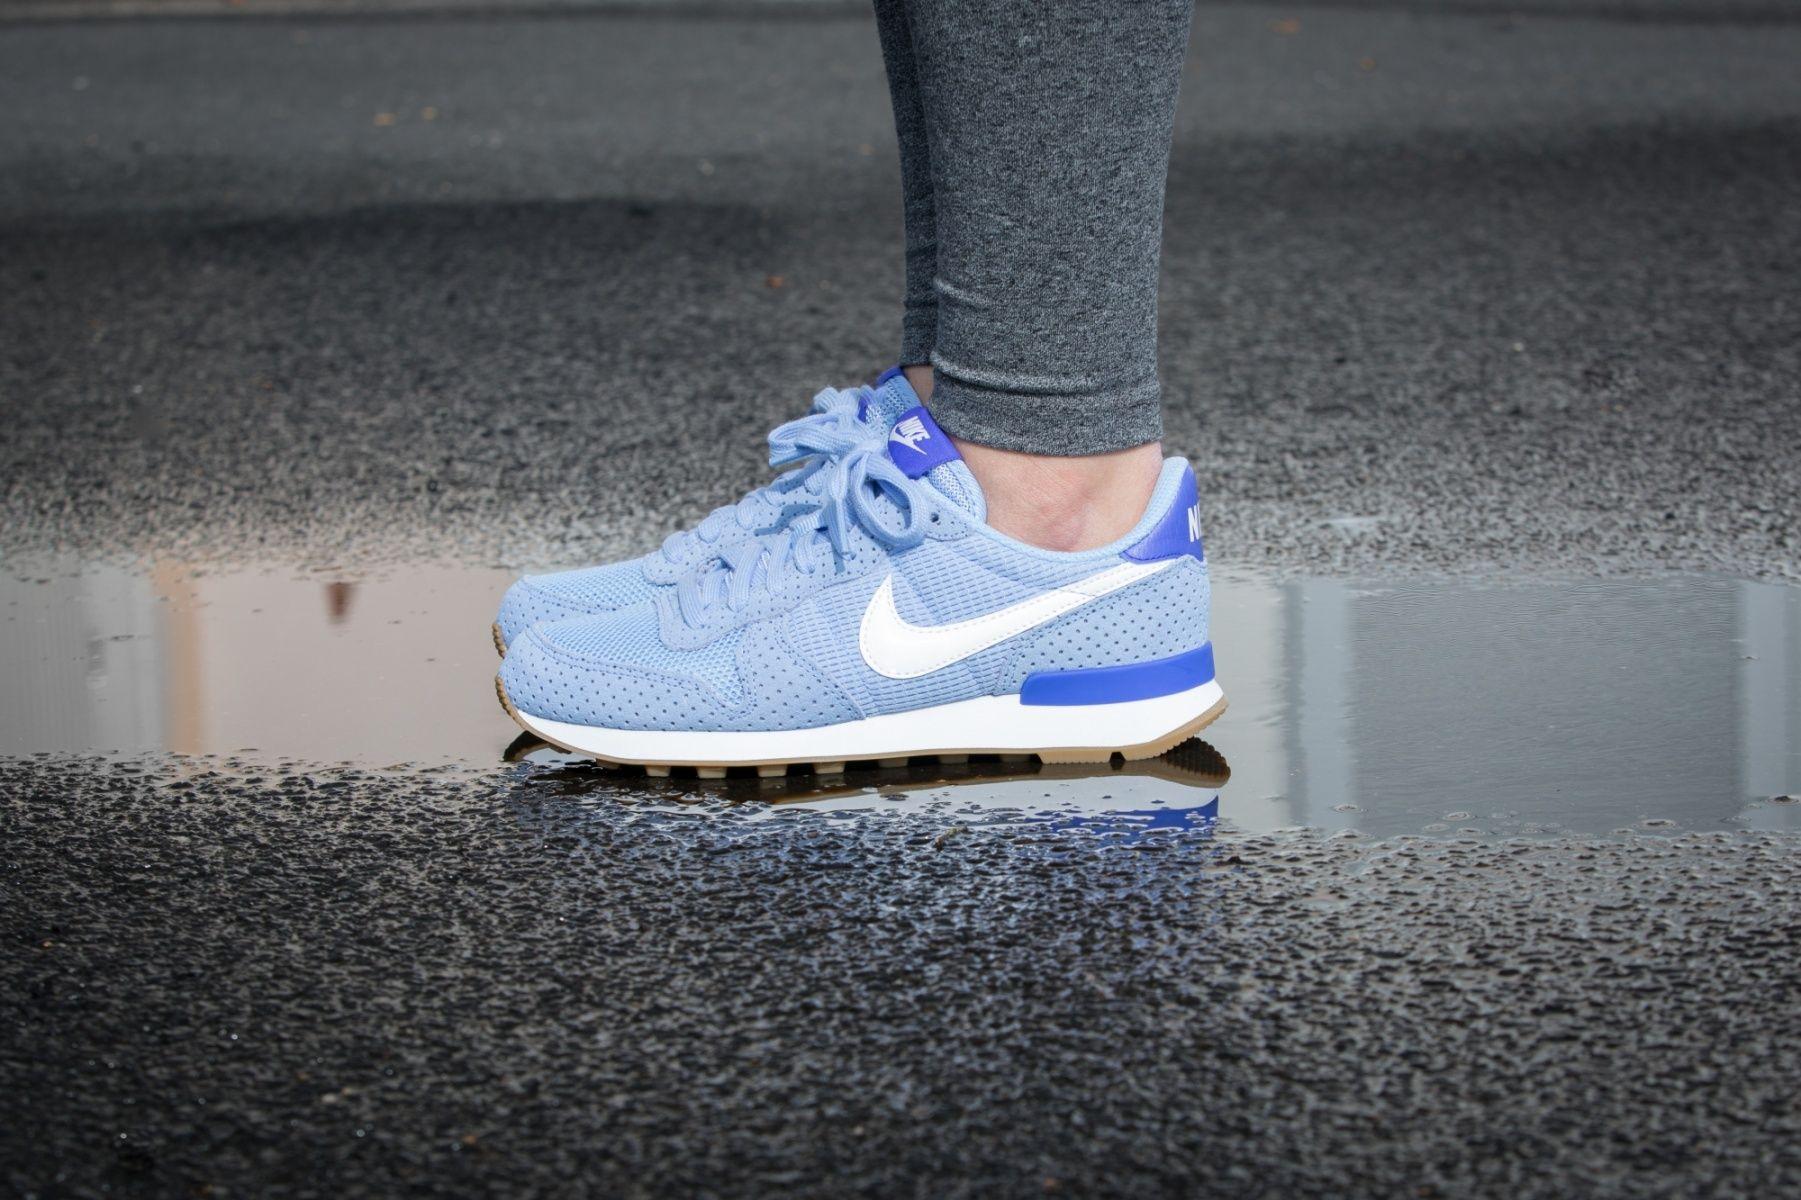 Nike WMNS Internationalist (blau) 828407 001 | 43einhalb